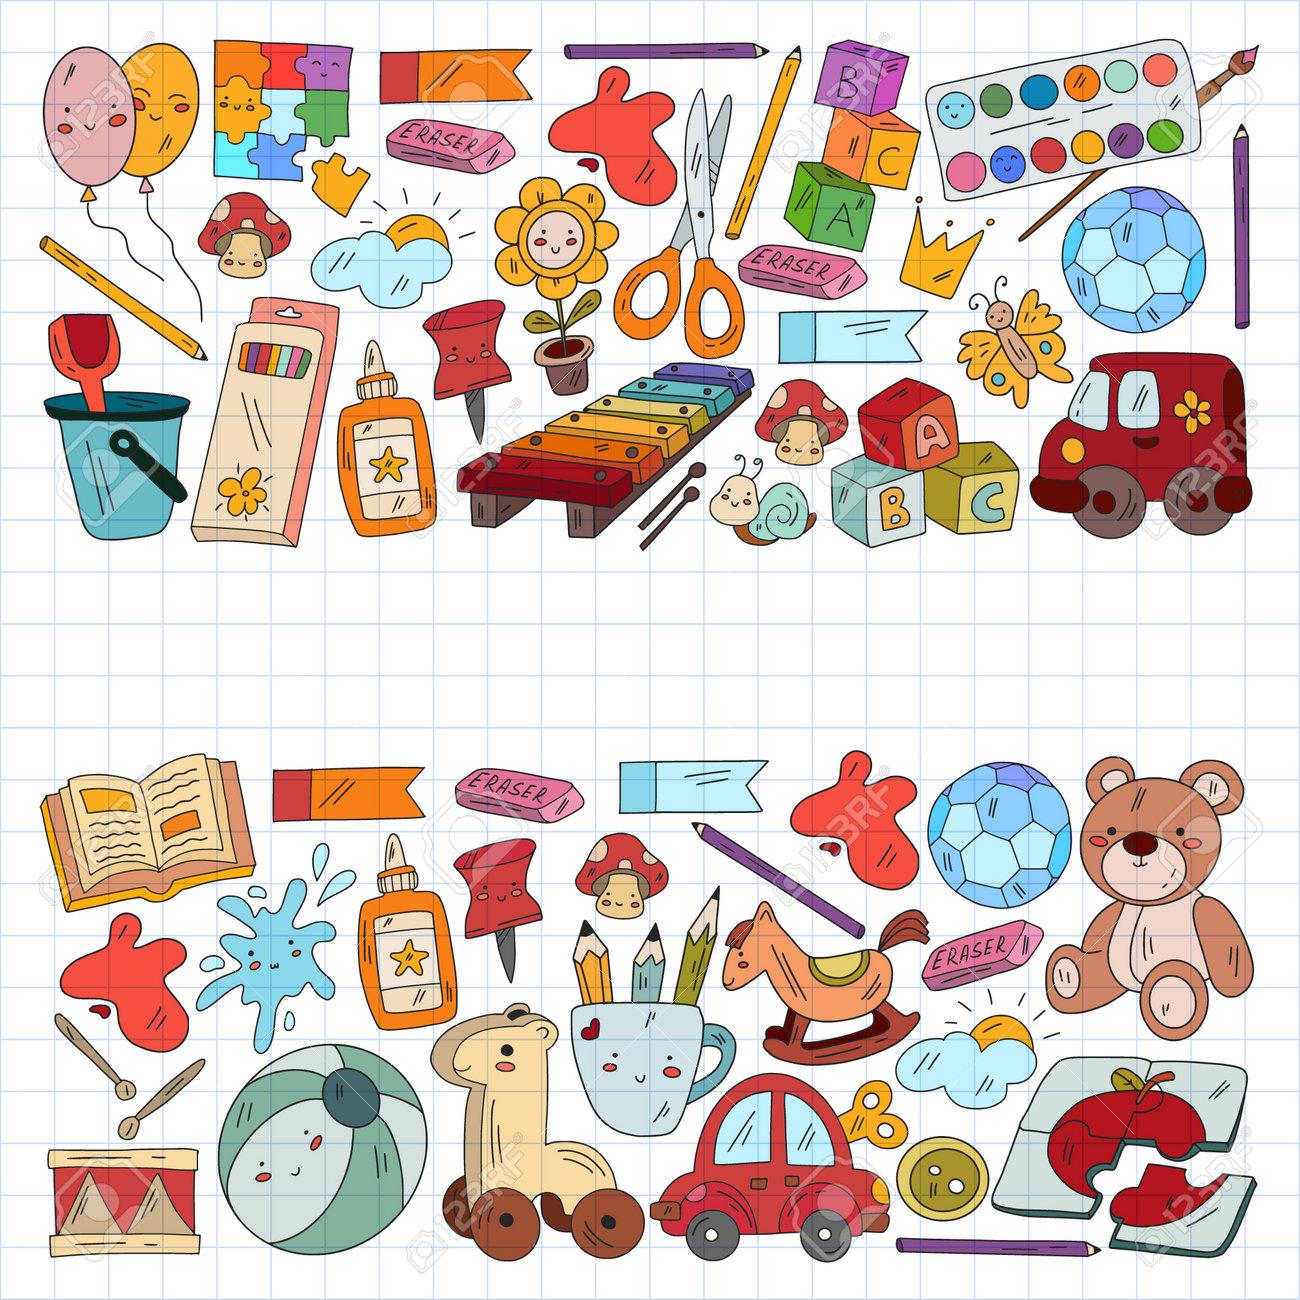 Children play with toys in the kindergarten. Kids playground. Education, creativity, imagination. - 173370078